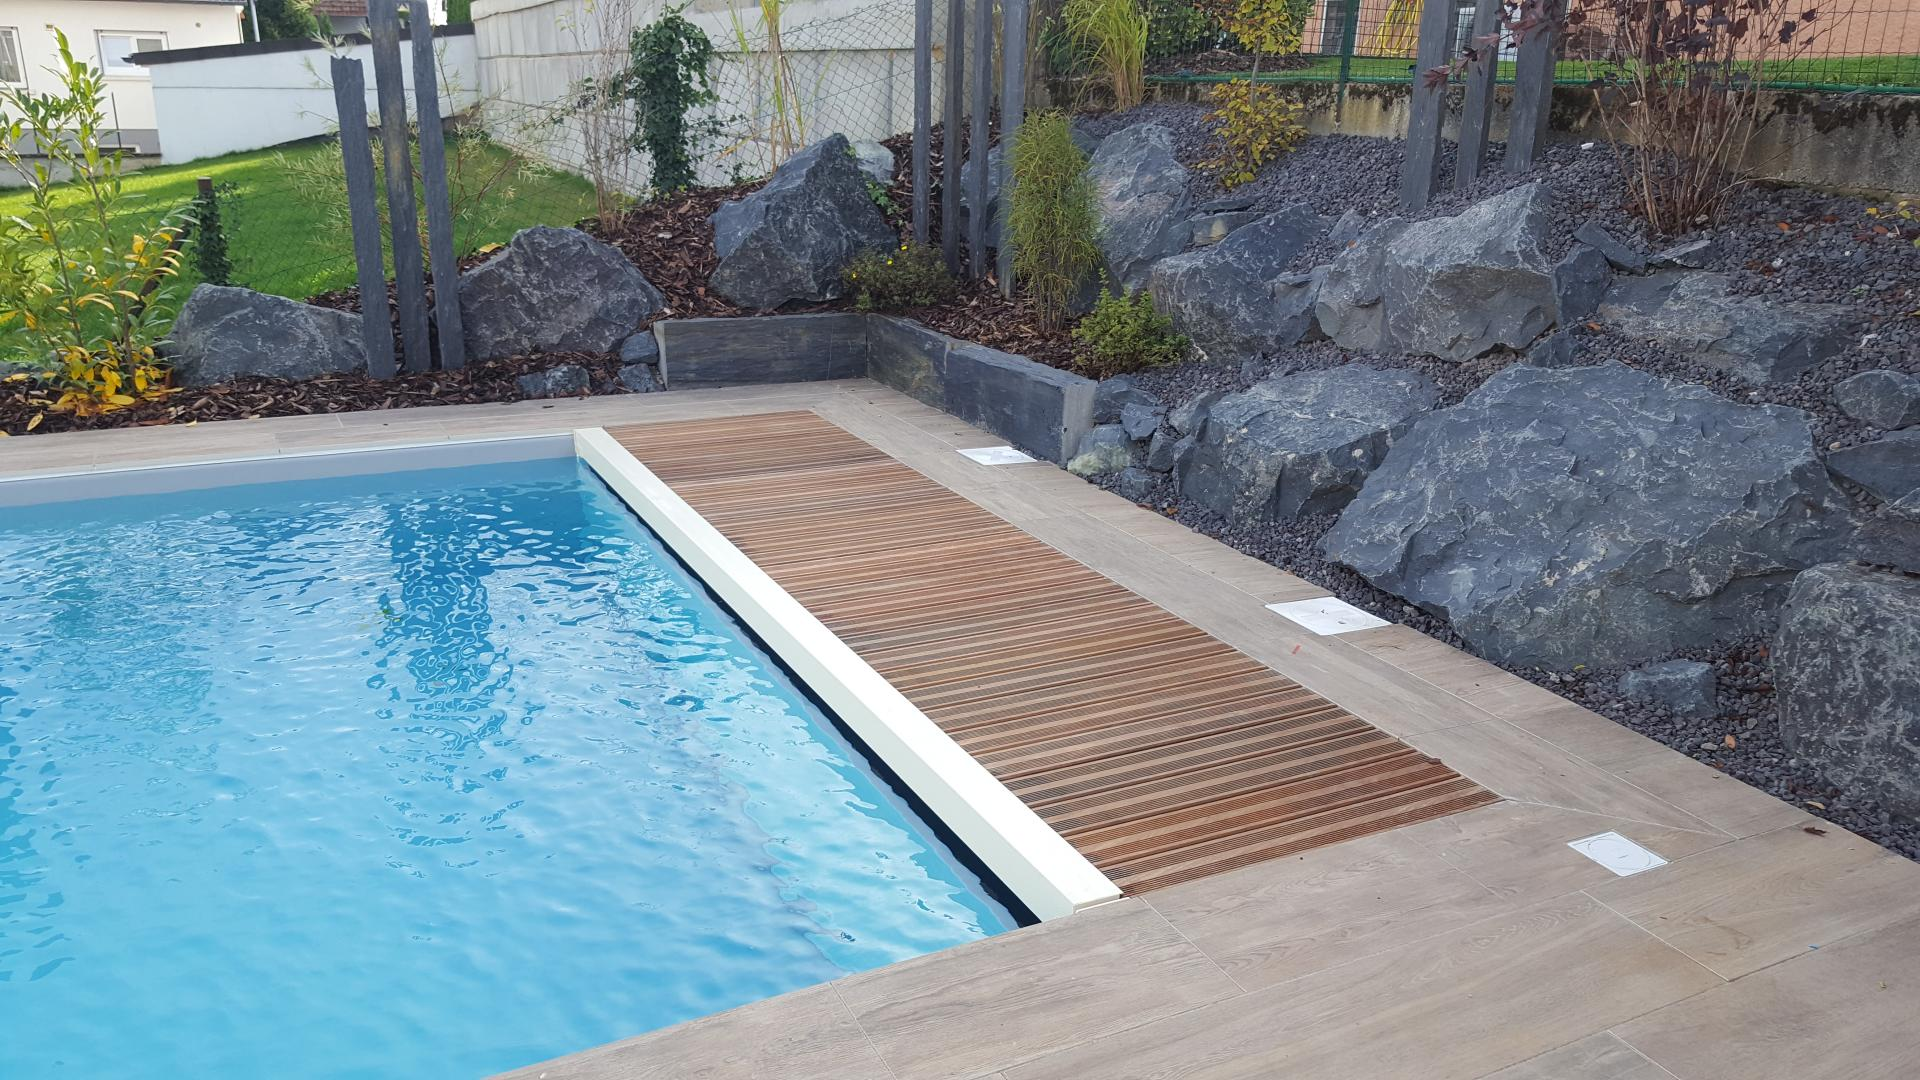 traitement piscine sel good comment passer duun. Black Bedroom Furniture Sets. Home Design Ideas